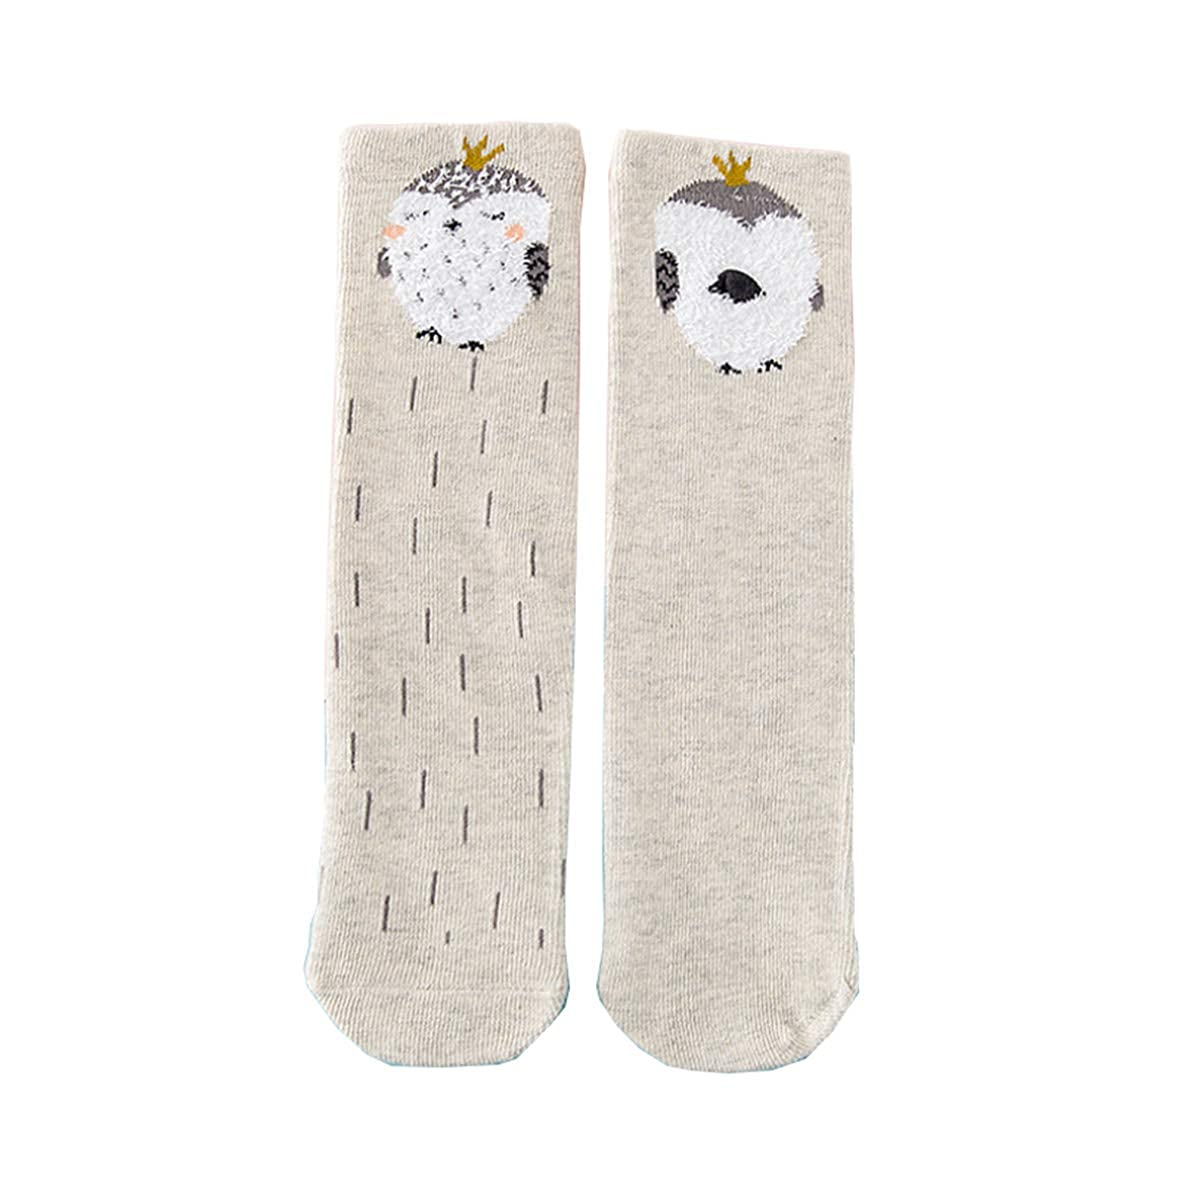 Little Girls Knee High Cotton Socks Cute Cartoon Animal Dress Socks Stockings